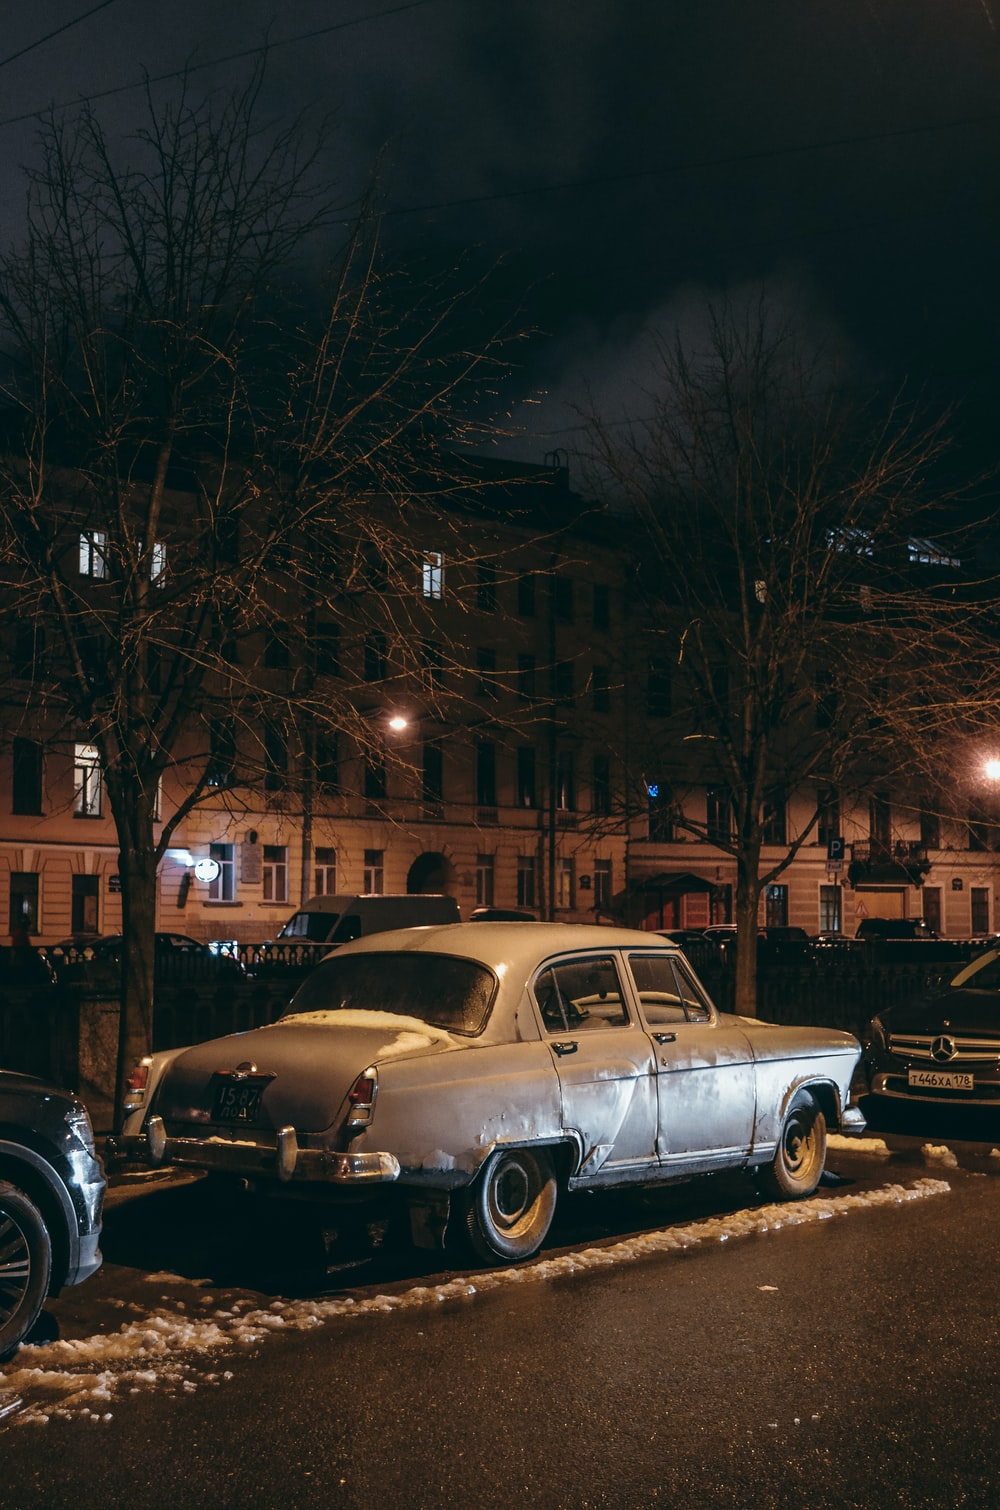 gray sedan outdoor during night time